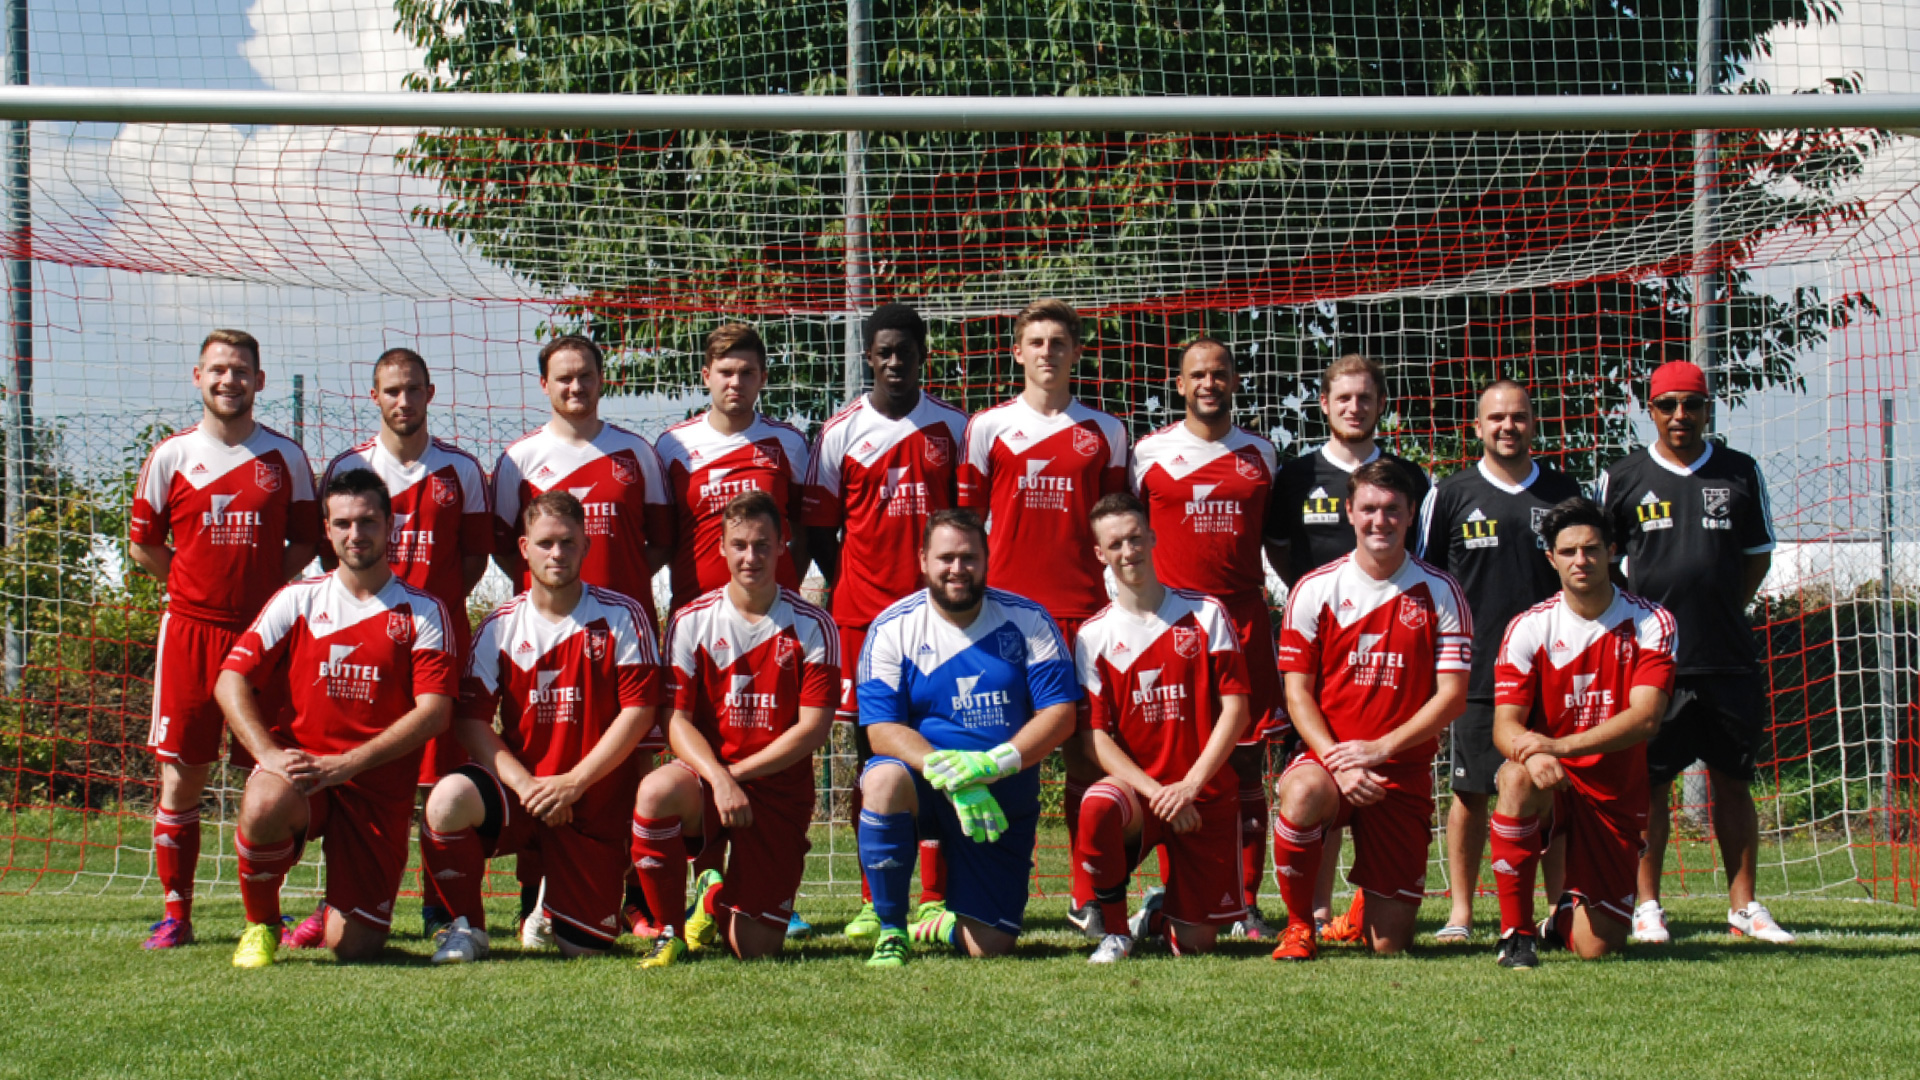 TSV Rhenania Rheindürkheim 08 e.V. Fußballmannnschaft